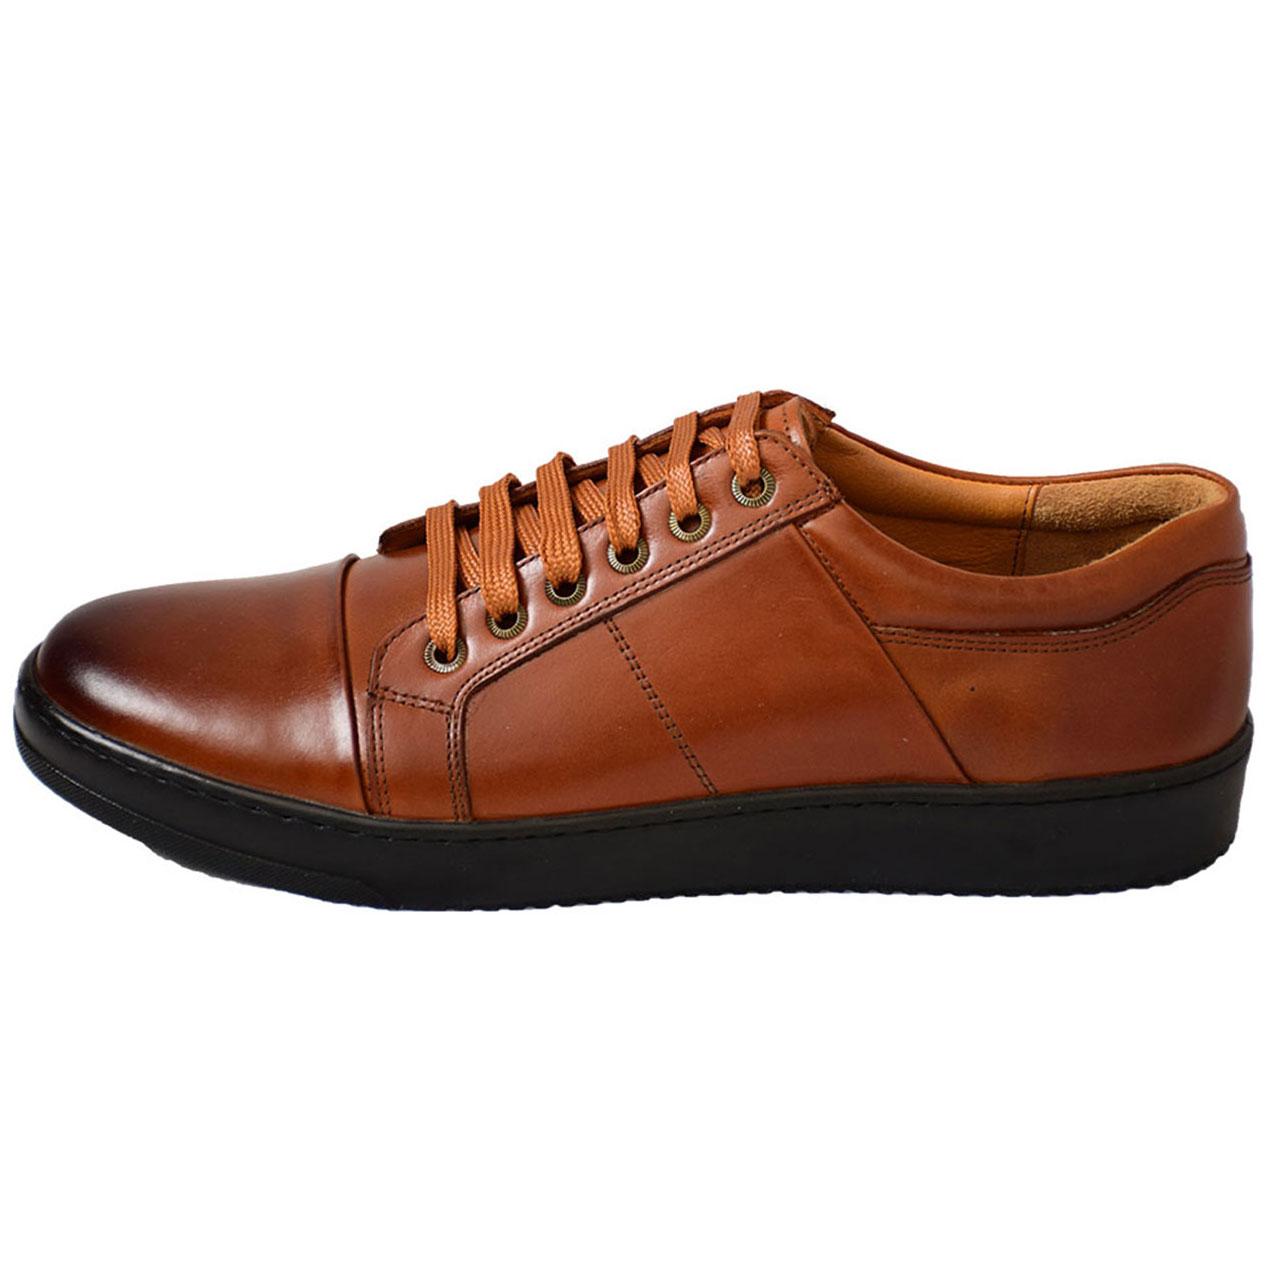 کفش روزمره مردانه مدل کرال